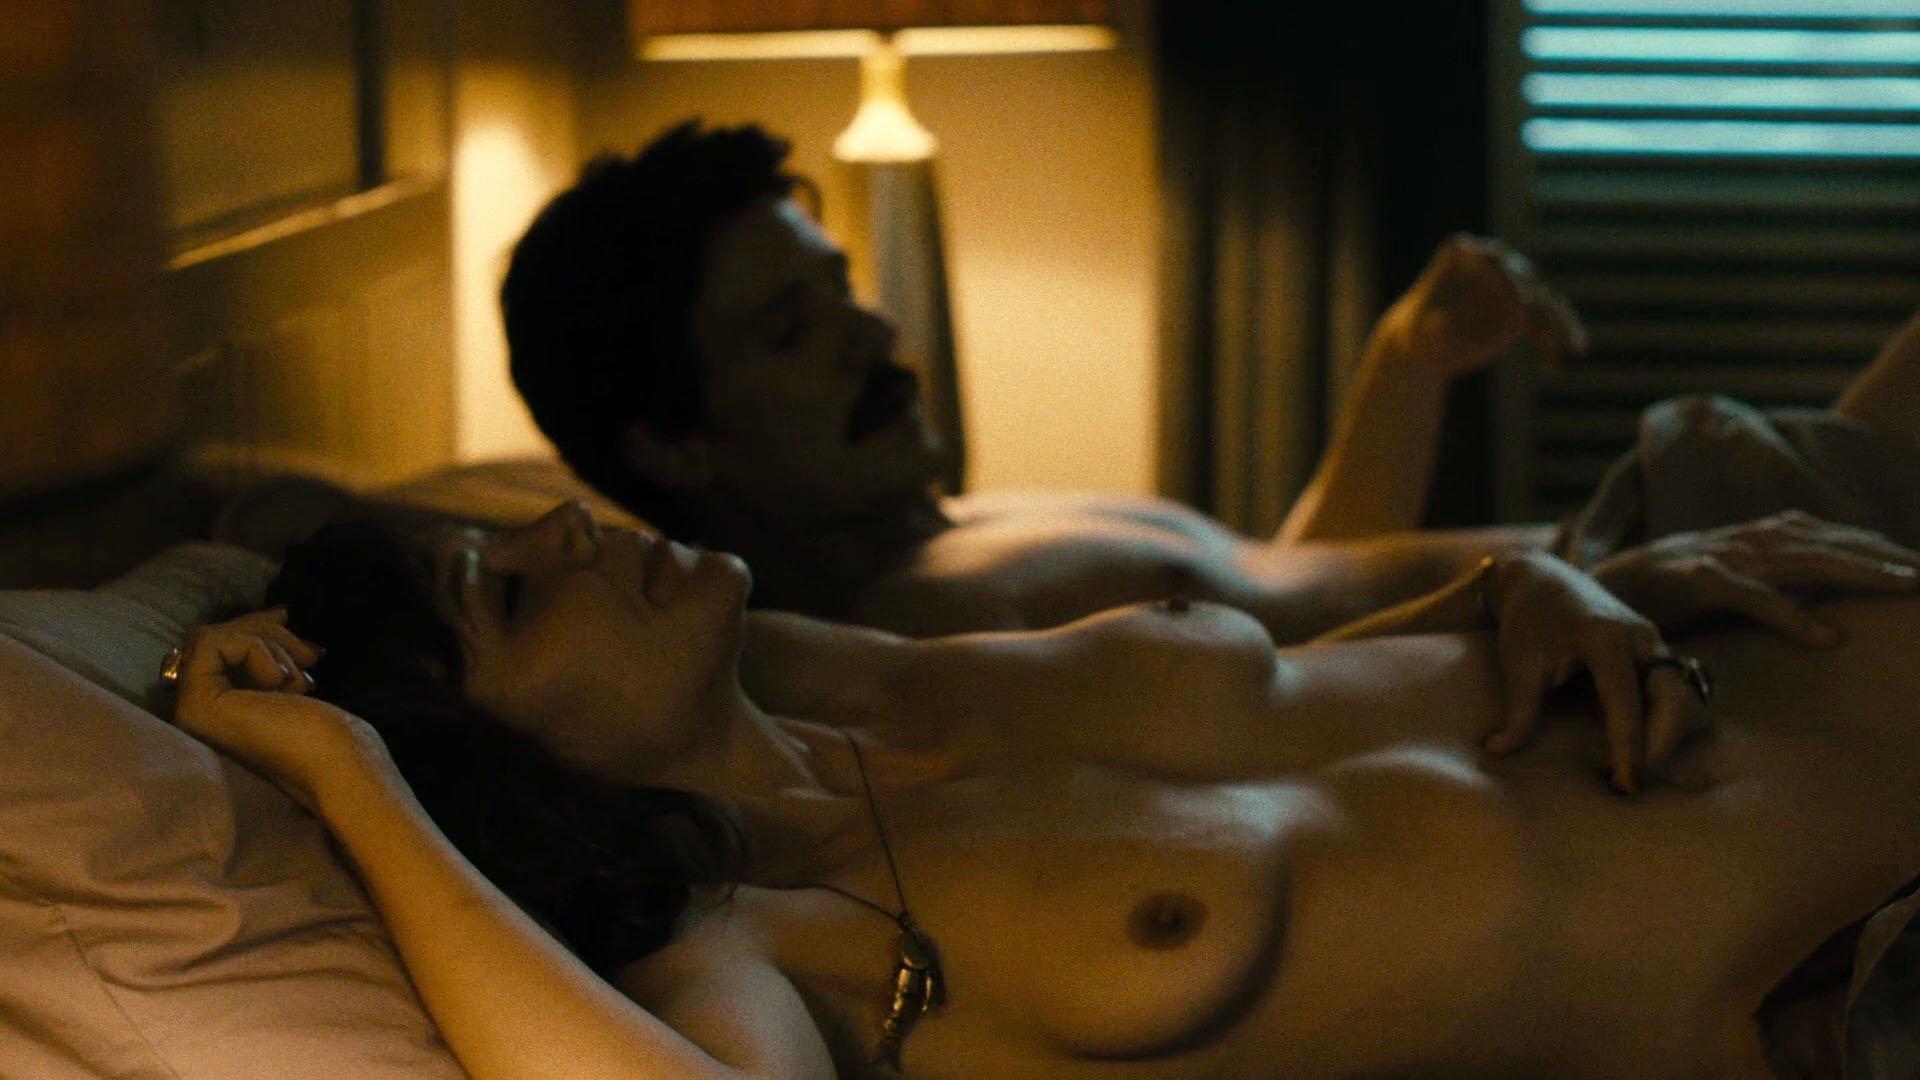 Maggie Gyllenhaal nude - The Deuce s01e05 (2017)